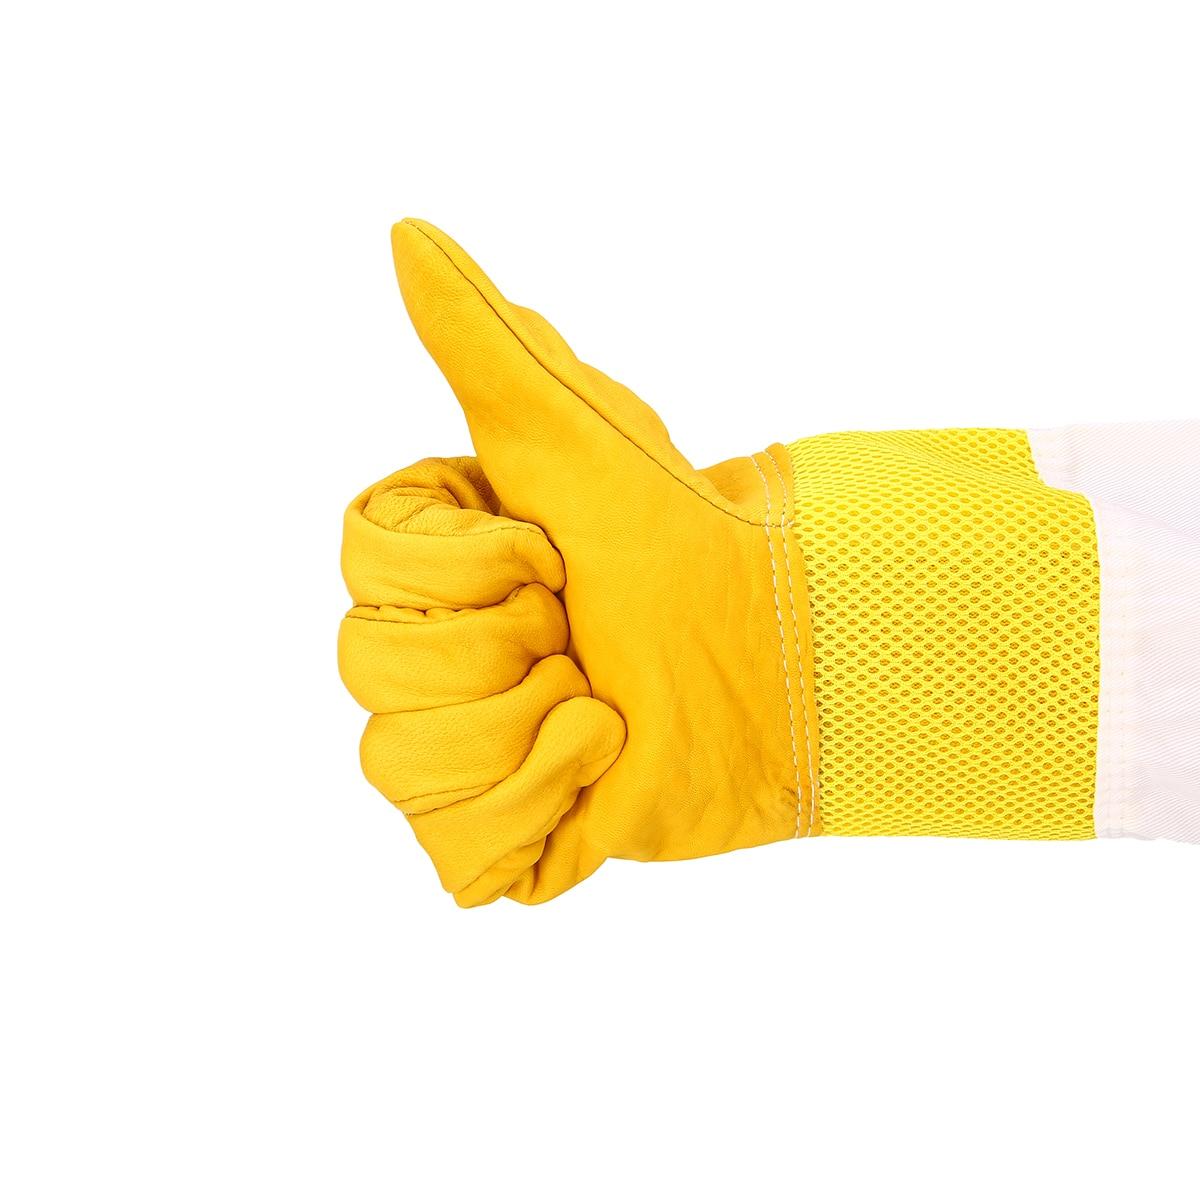 XL Beekeeping Gloves Goatskin Bee Keeping Vented Beekeeper Long Sleeves New